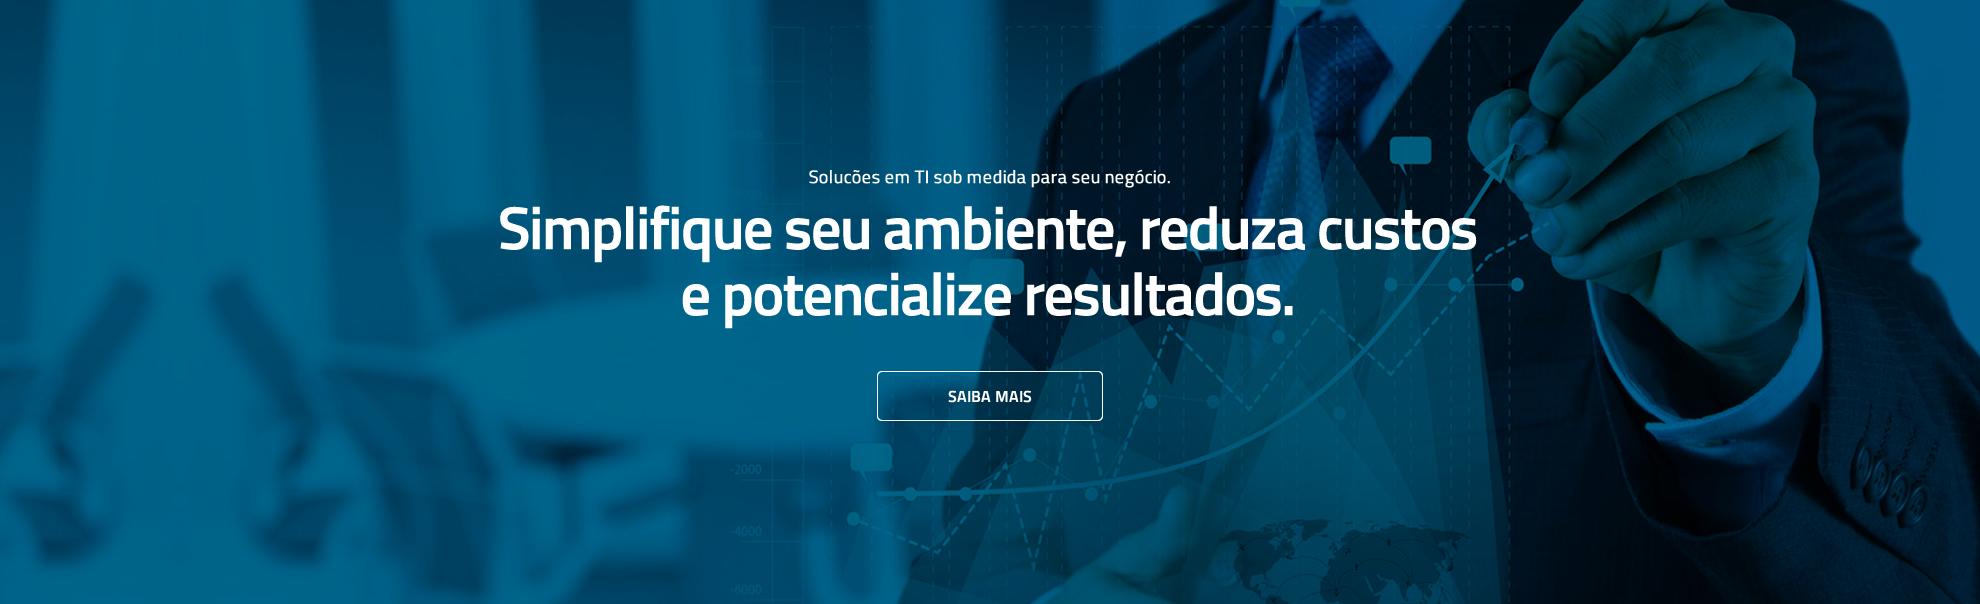 http://3solutions.com.br/destaque/destaque/